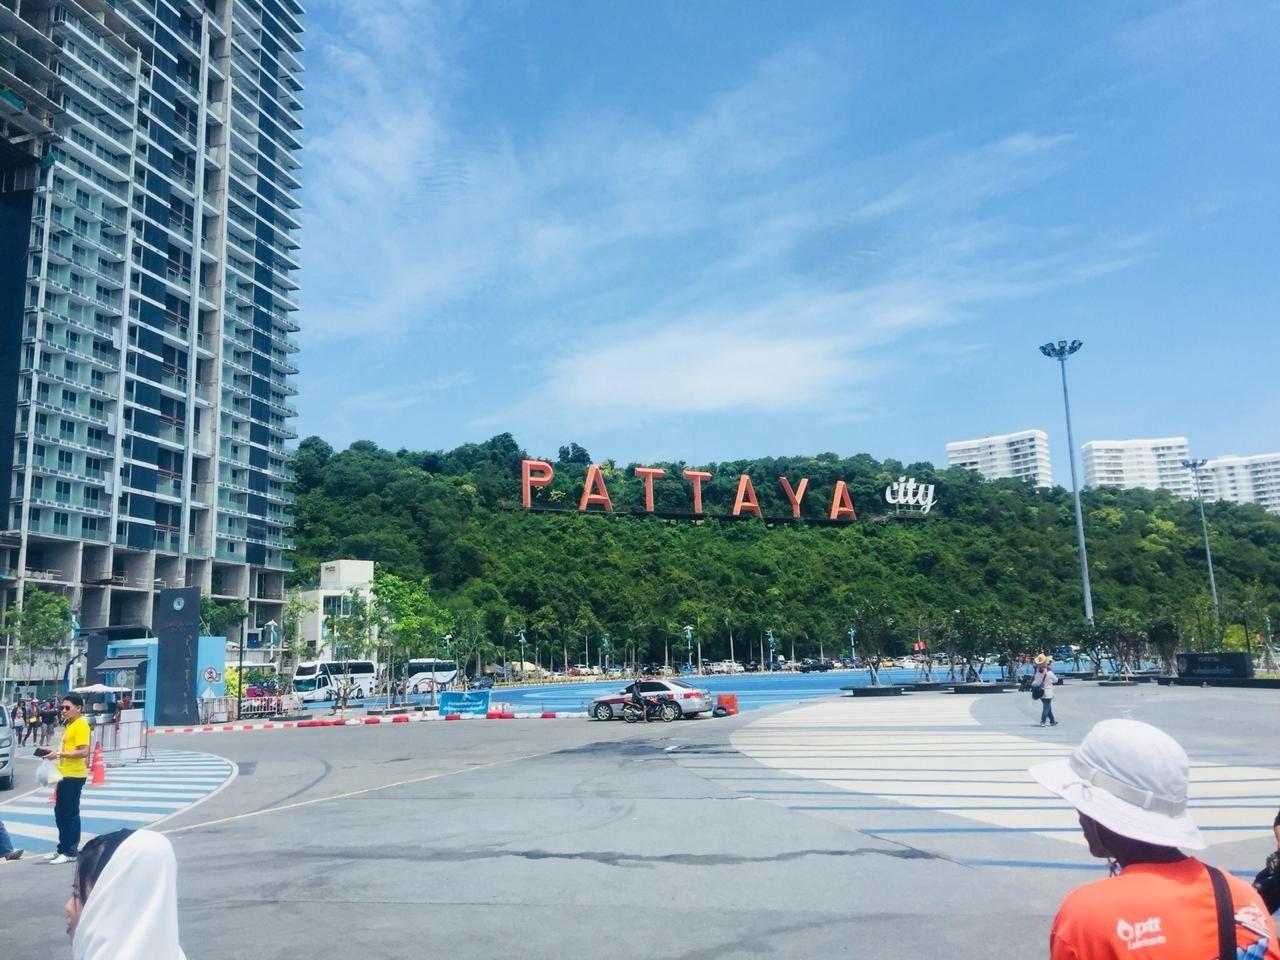 Photo of Pattaya City By Ishu Raj Bagrecha